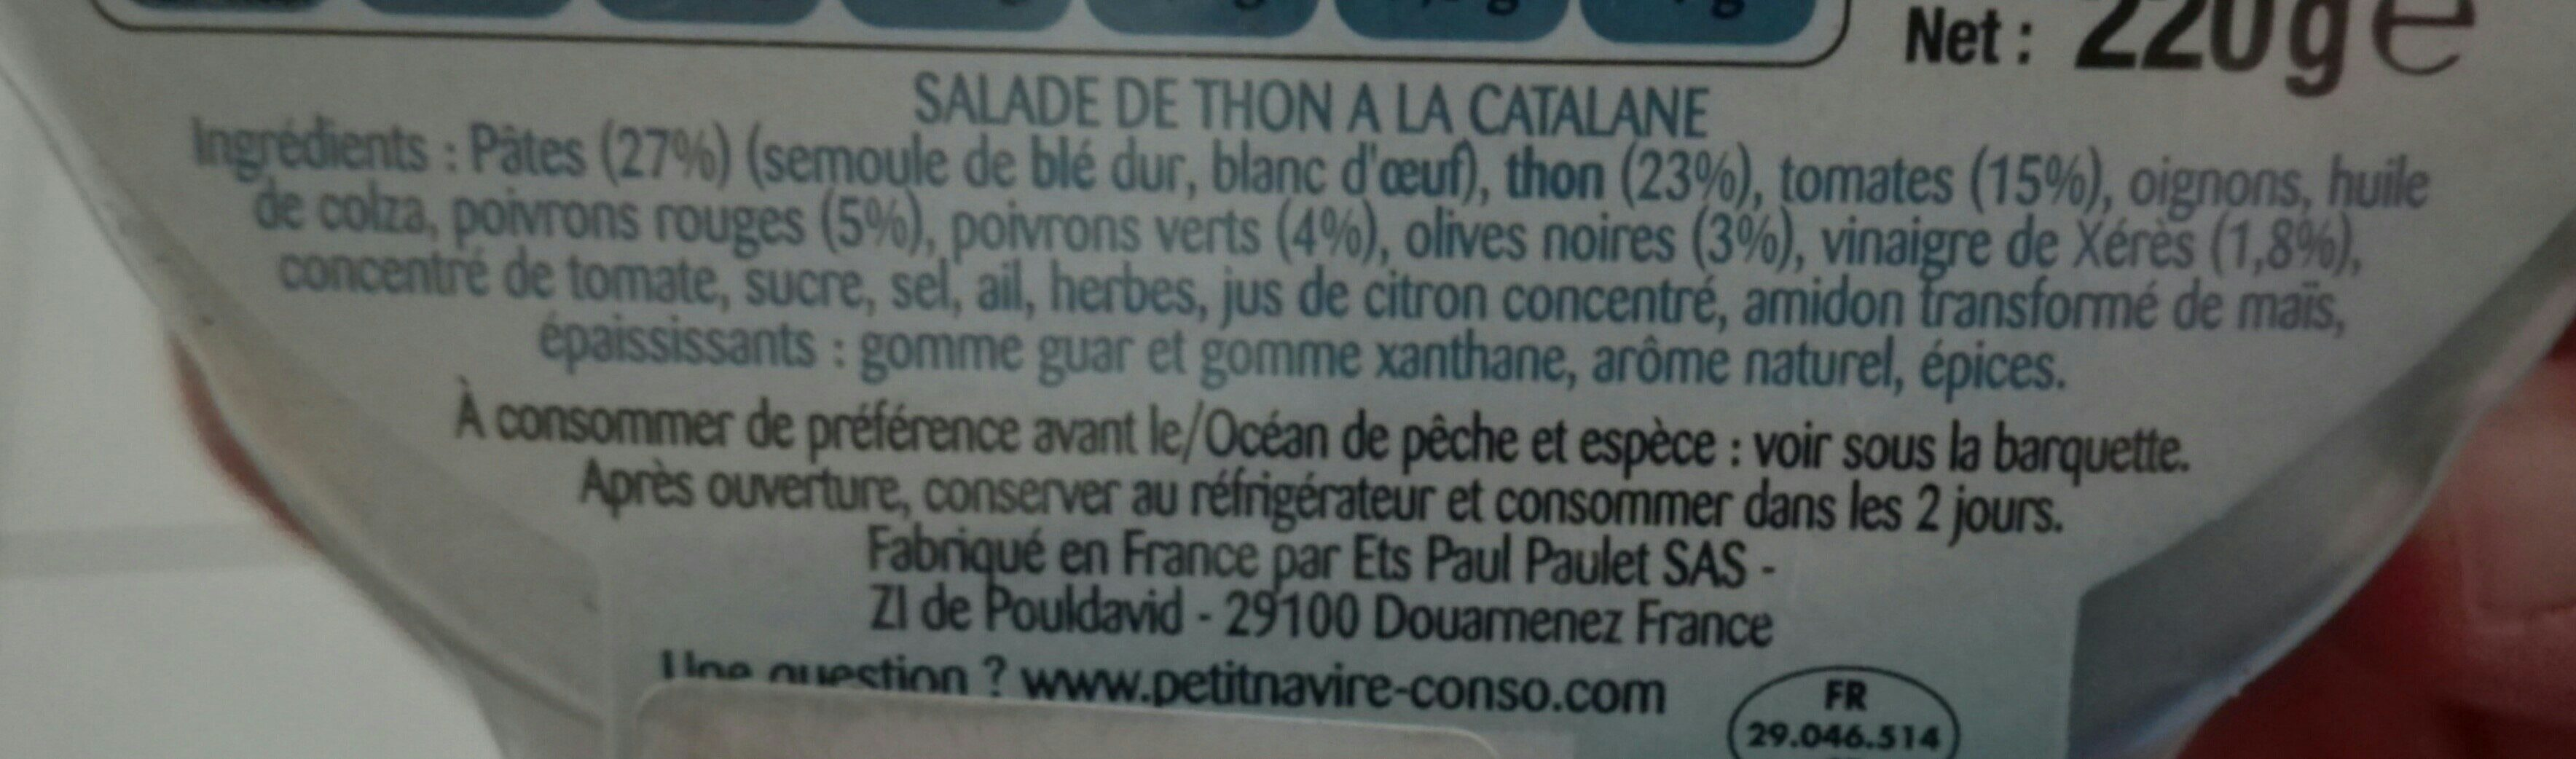 Salade Catalane Petit Navire, - Ingredients - fr